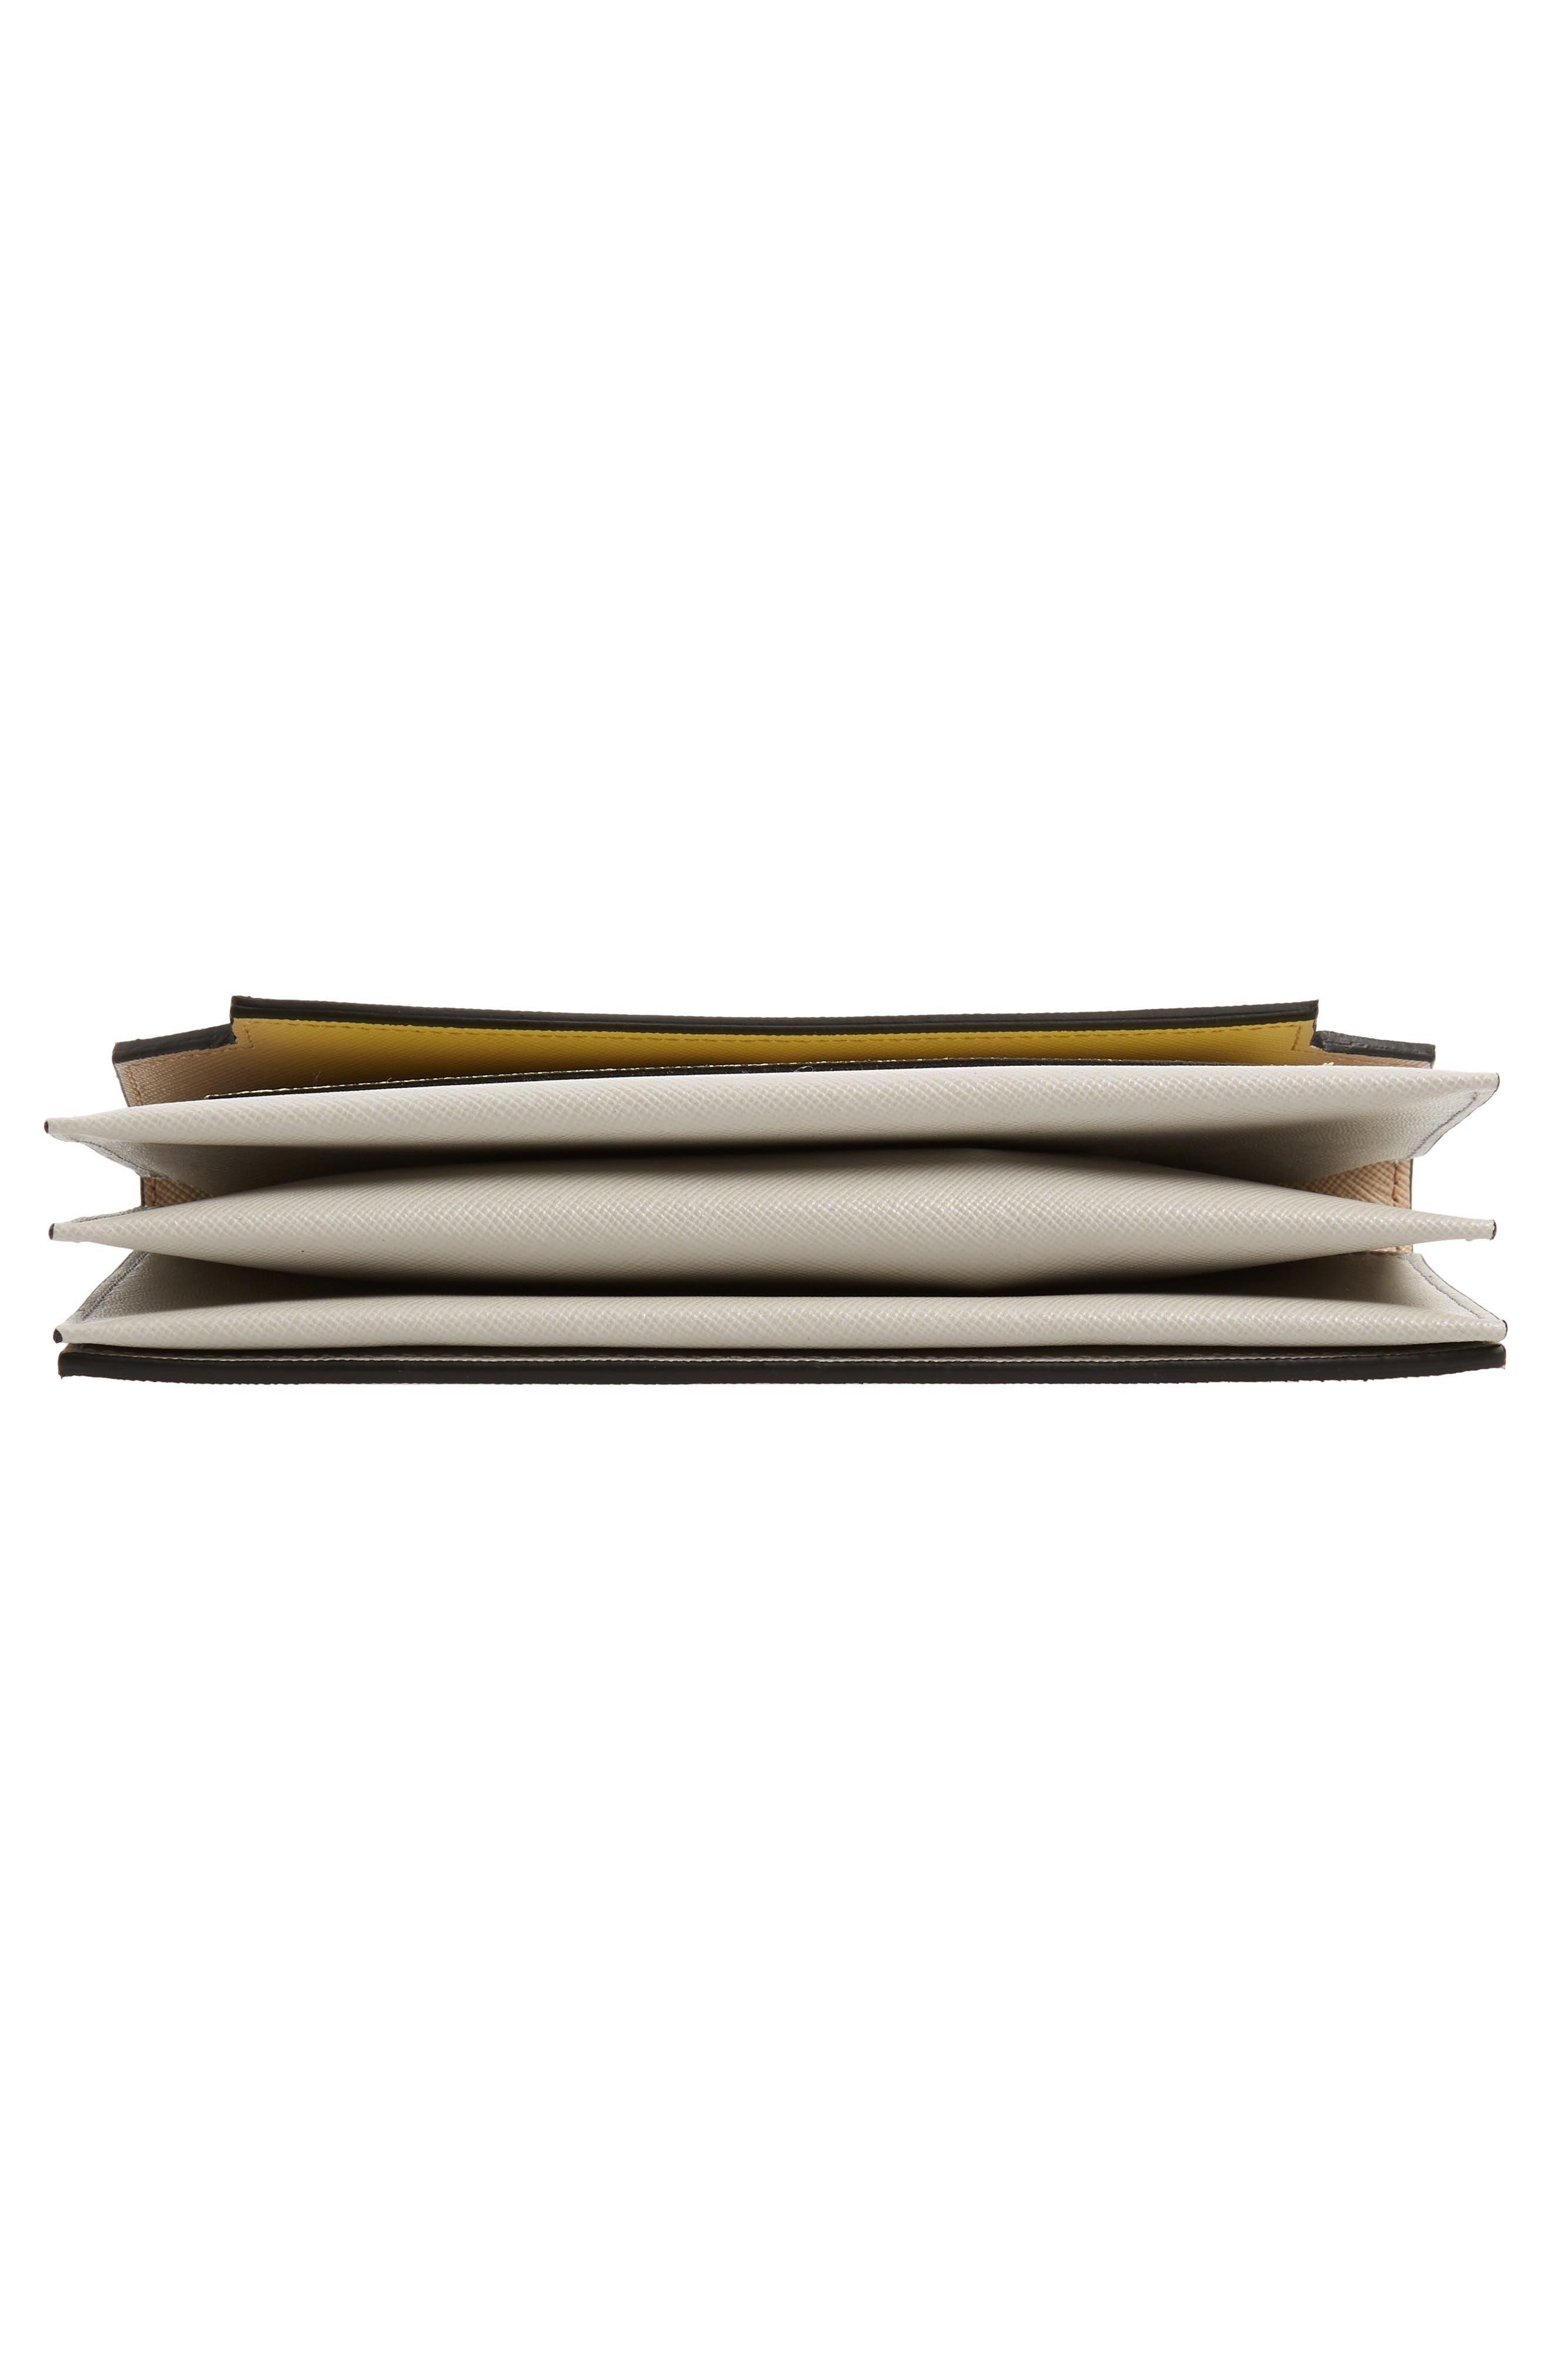 Trunk Leather Crossbody Wallet,                             Alternate thumbnail 7, color,                             LIGHT CAMEL/ VANILLA/ PELICAN